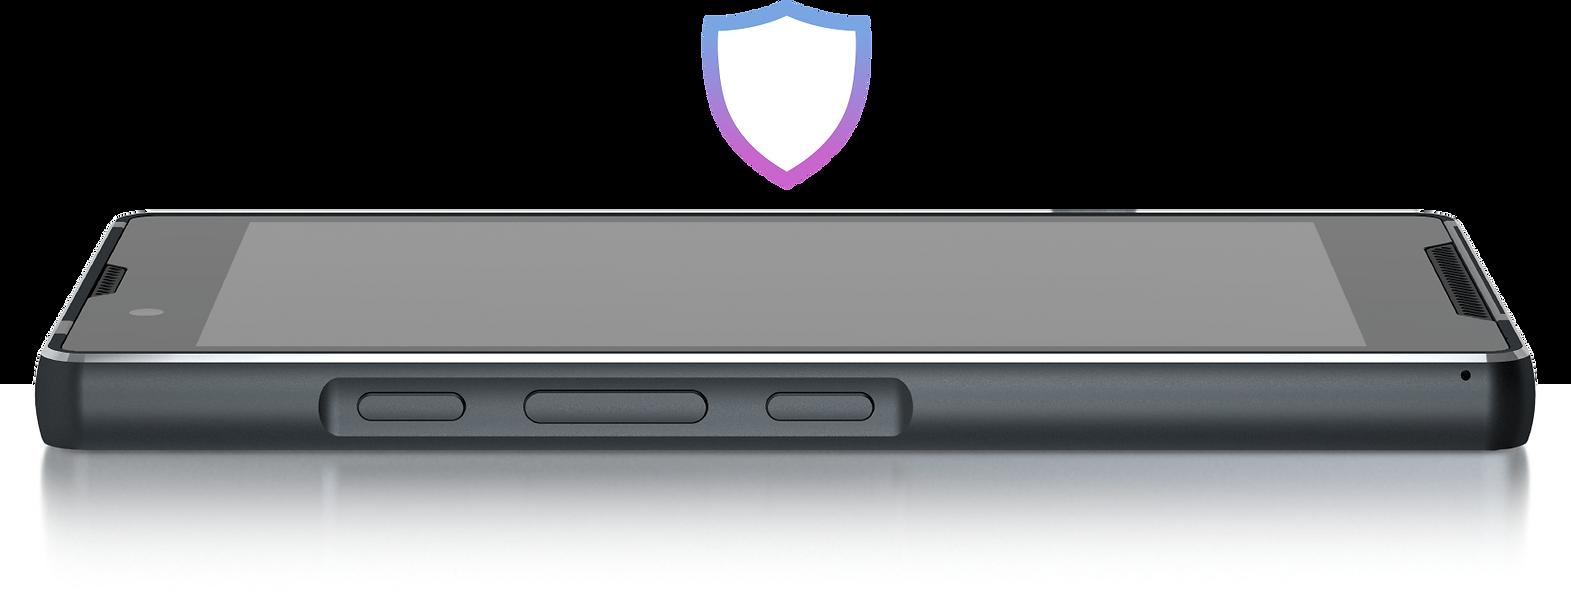 security-datanode@1x.png